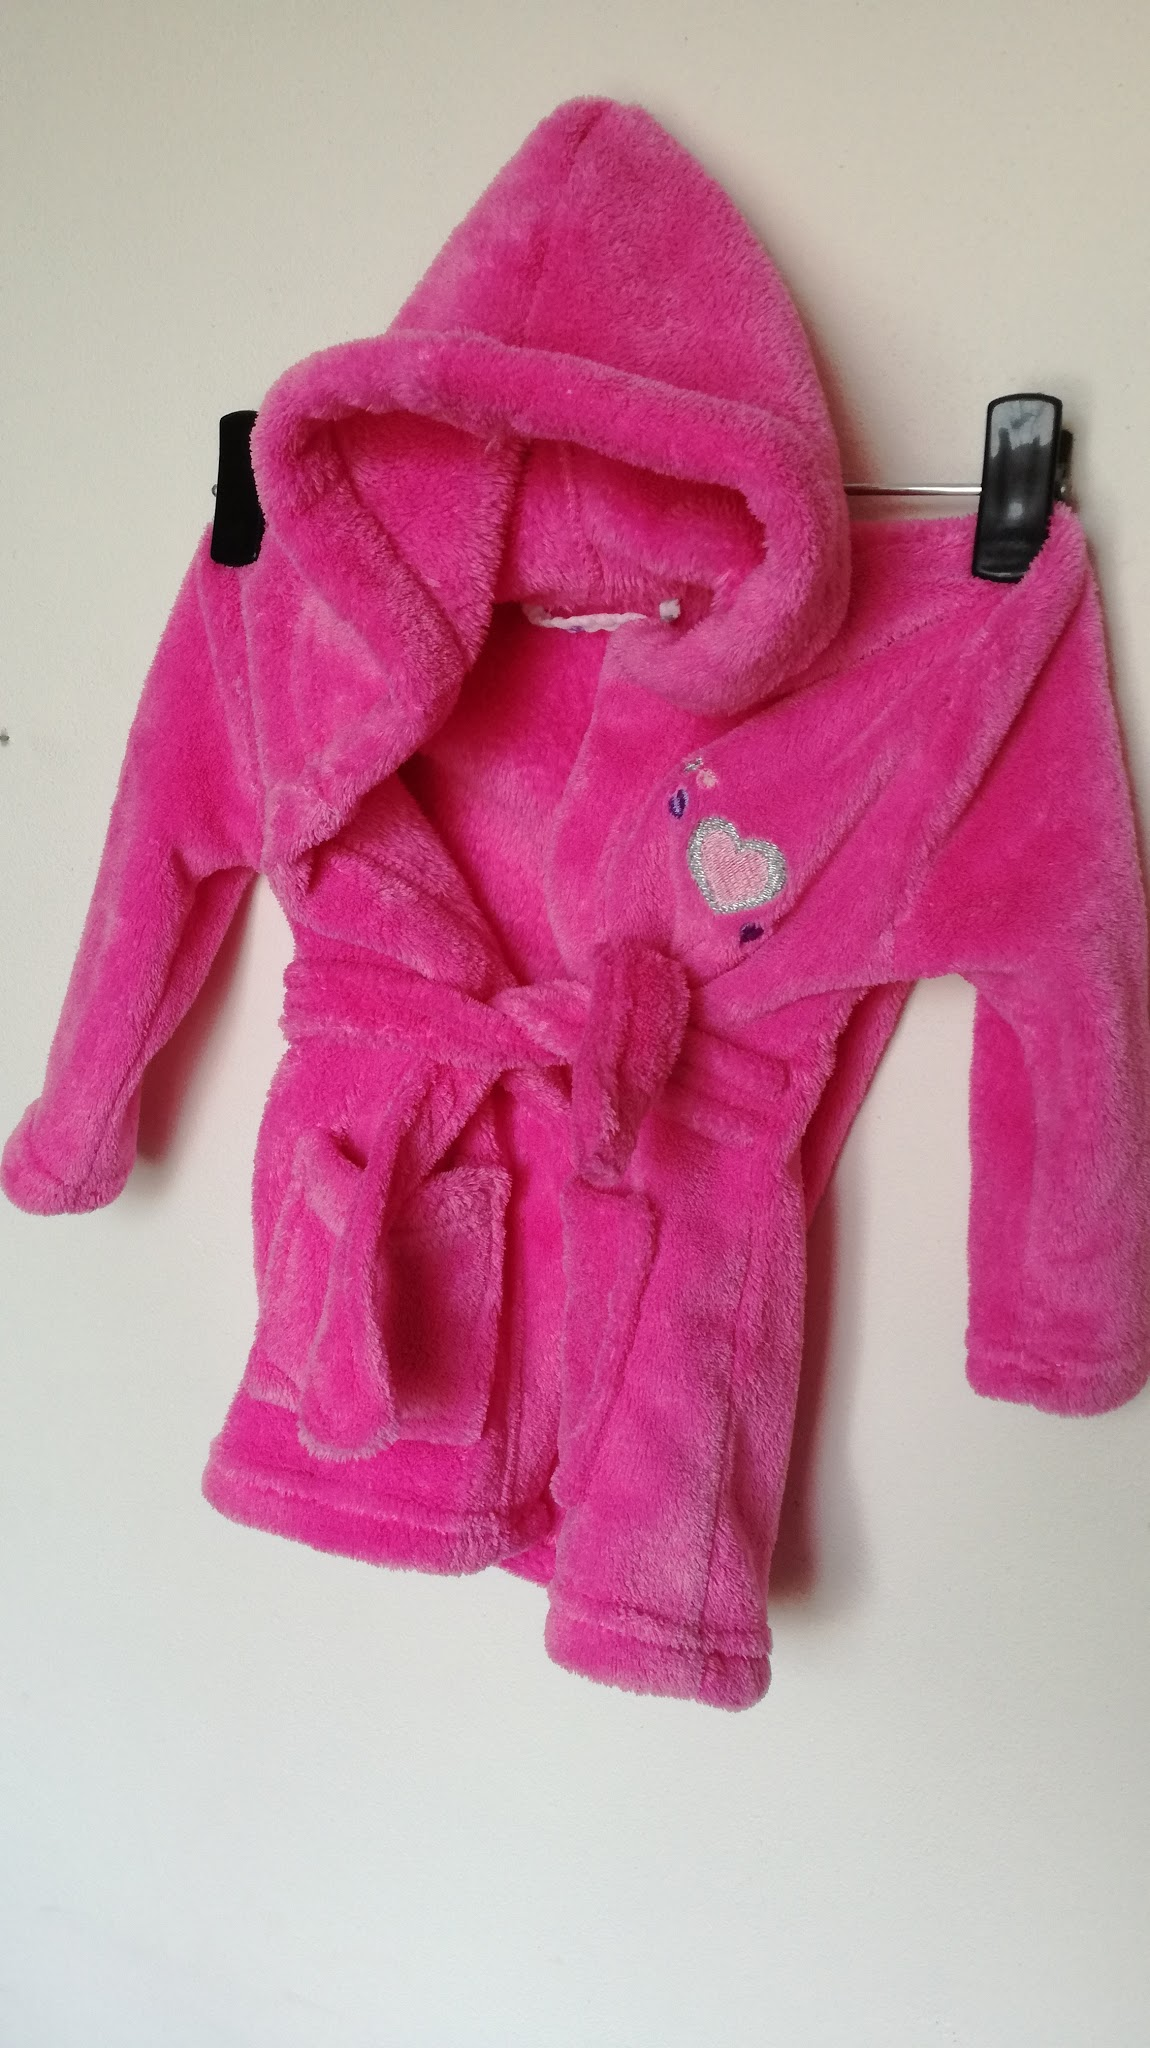 Růžový chlupatinkový župan se srdíčky vel.80